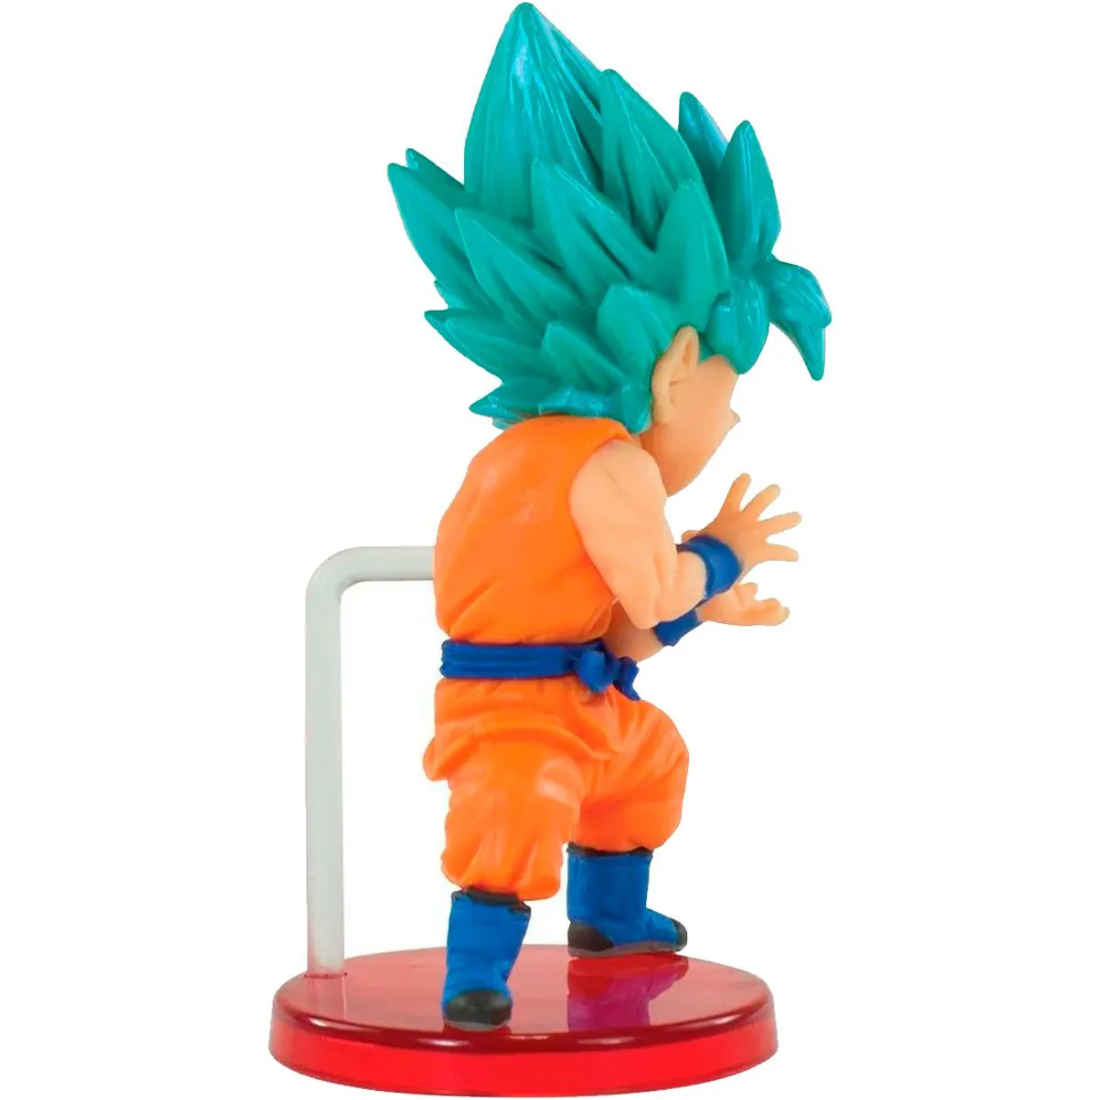 Banpresto Dragon Ball Super WCF Vol. 10 Son Goku